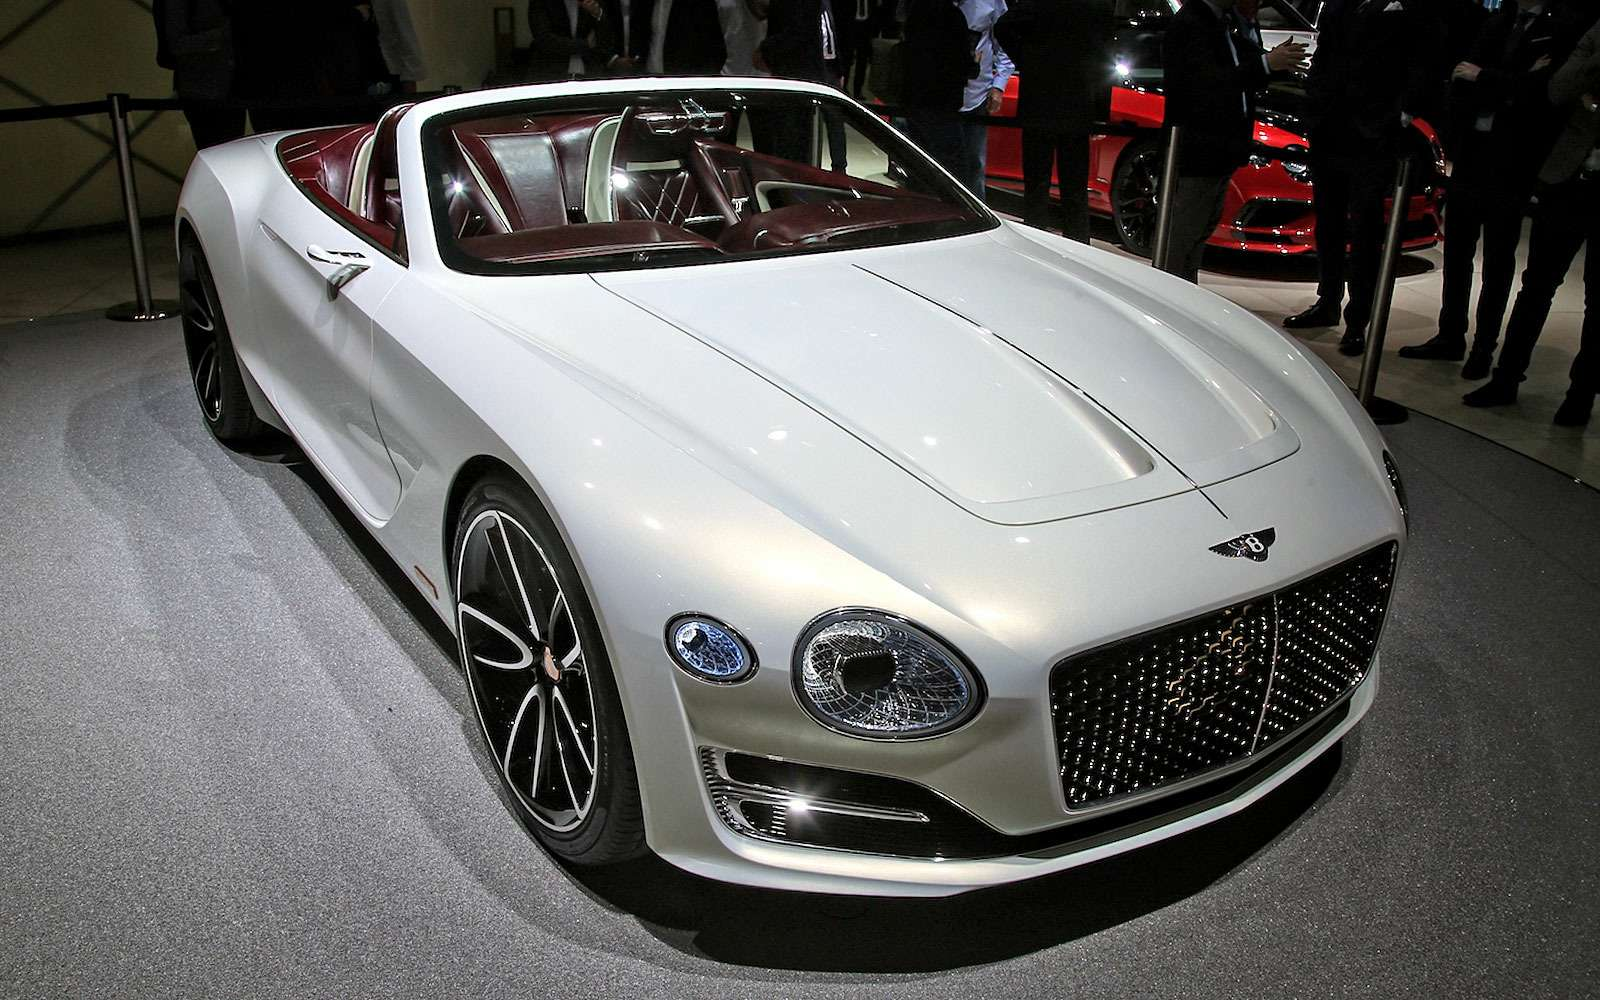 Безвредная красота: Bentley показала родстер EXP 12Speed 6e— фото 718271